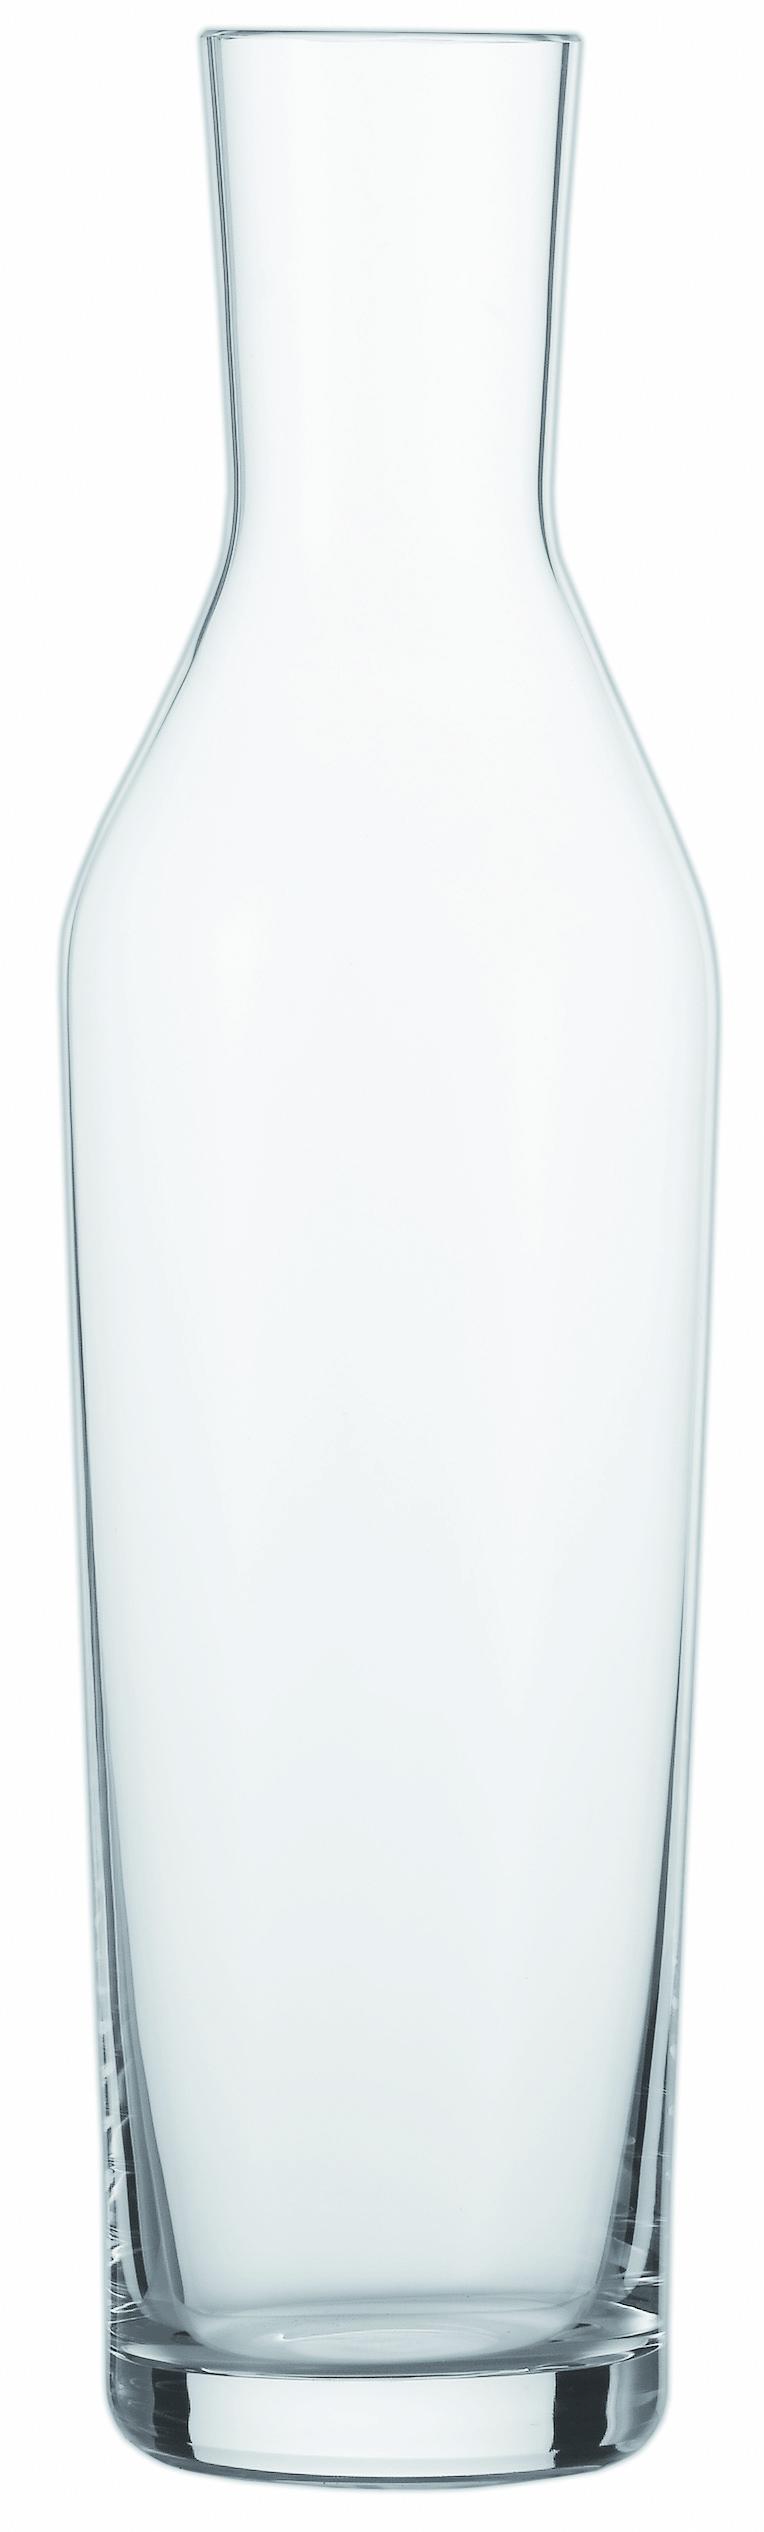 Waterkaraf nr. 3 - Basic bar Selection